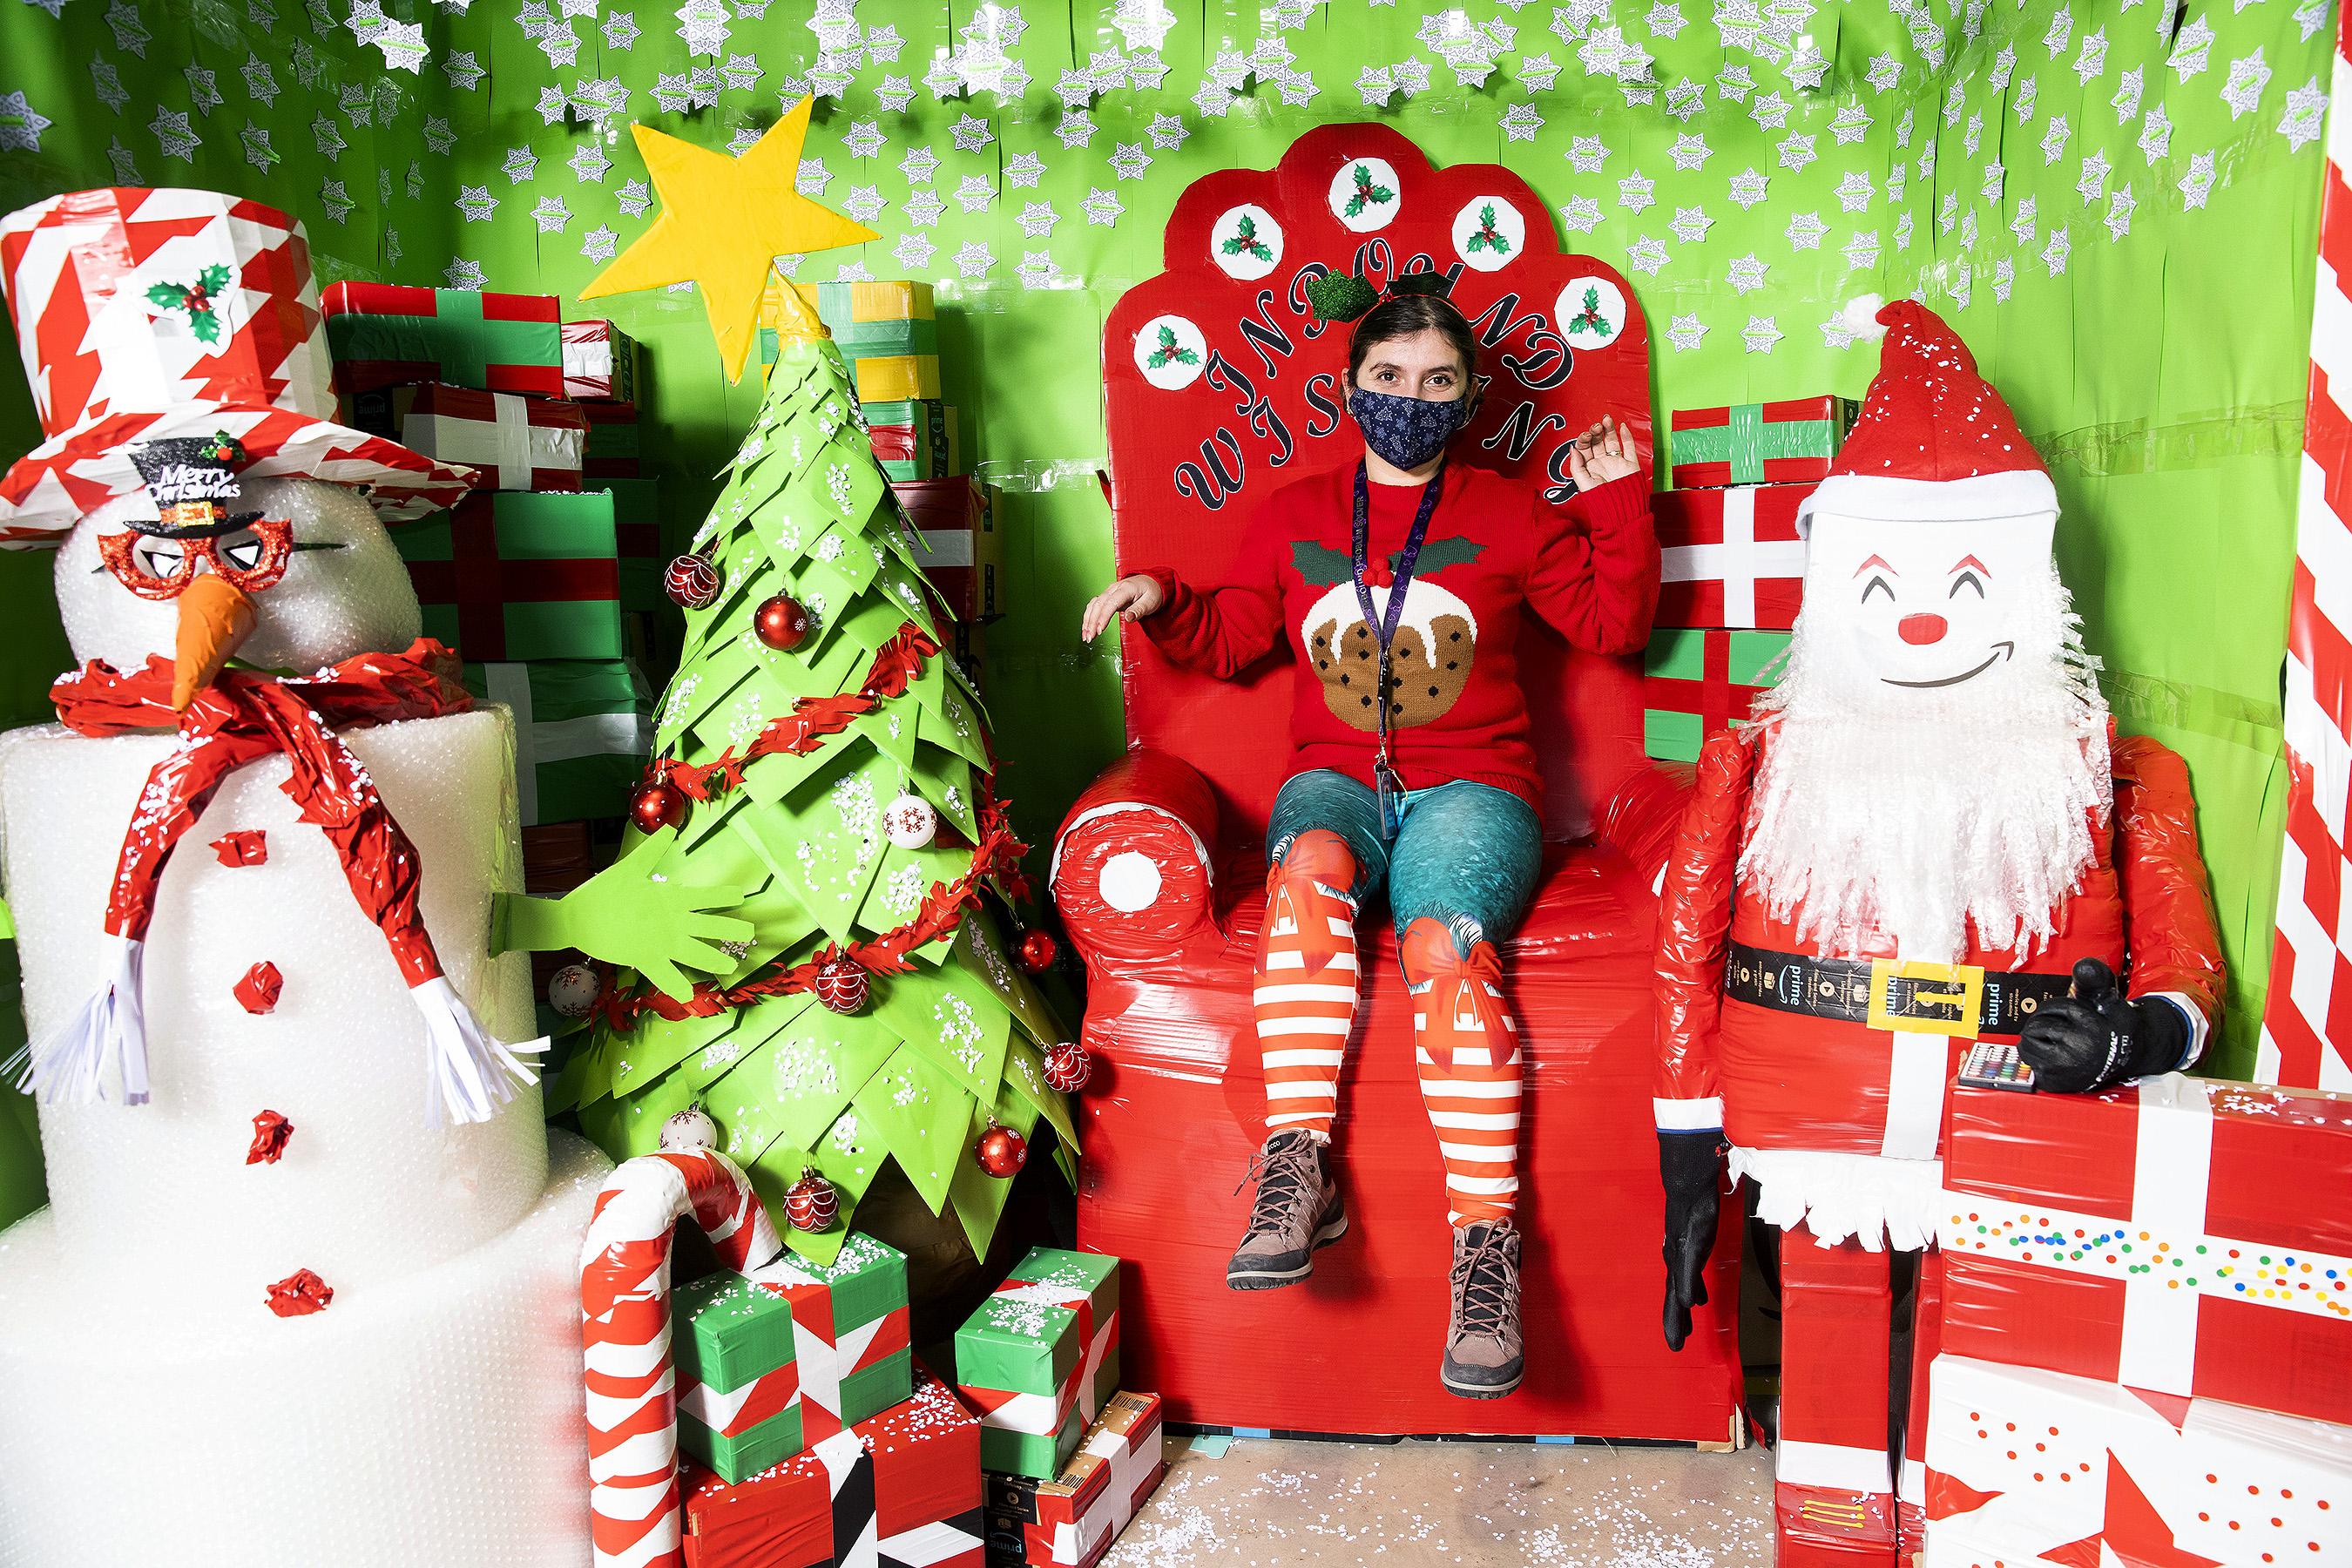 Festive fun for Kegworth team to celebrate countdown to Christmas